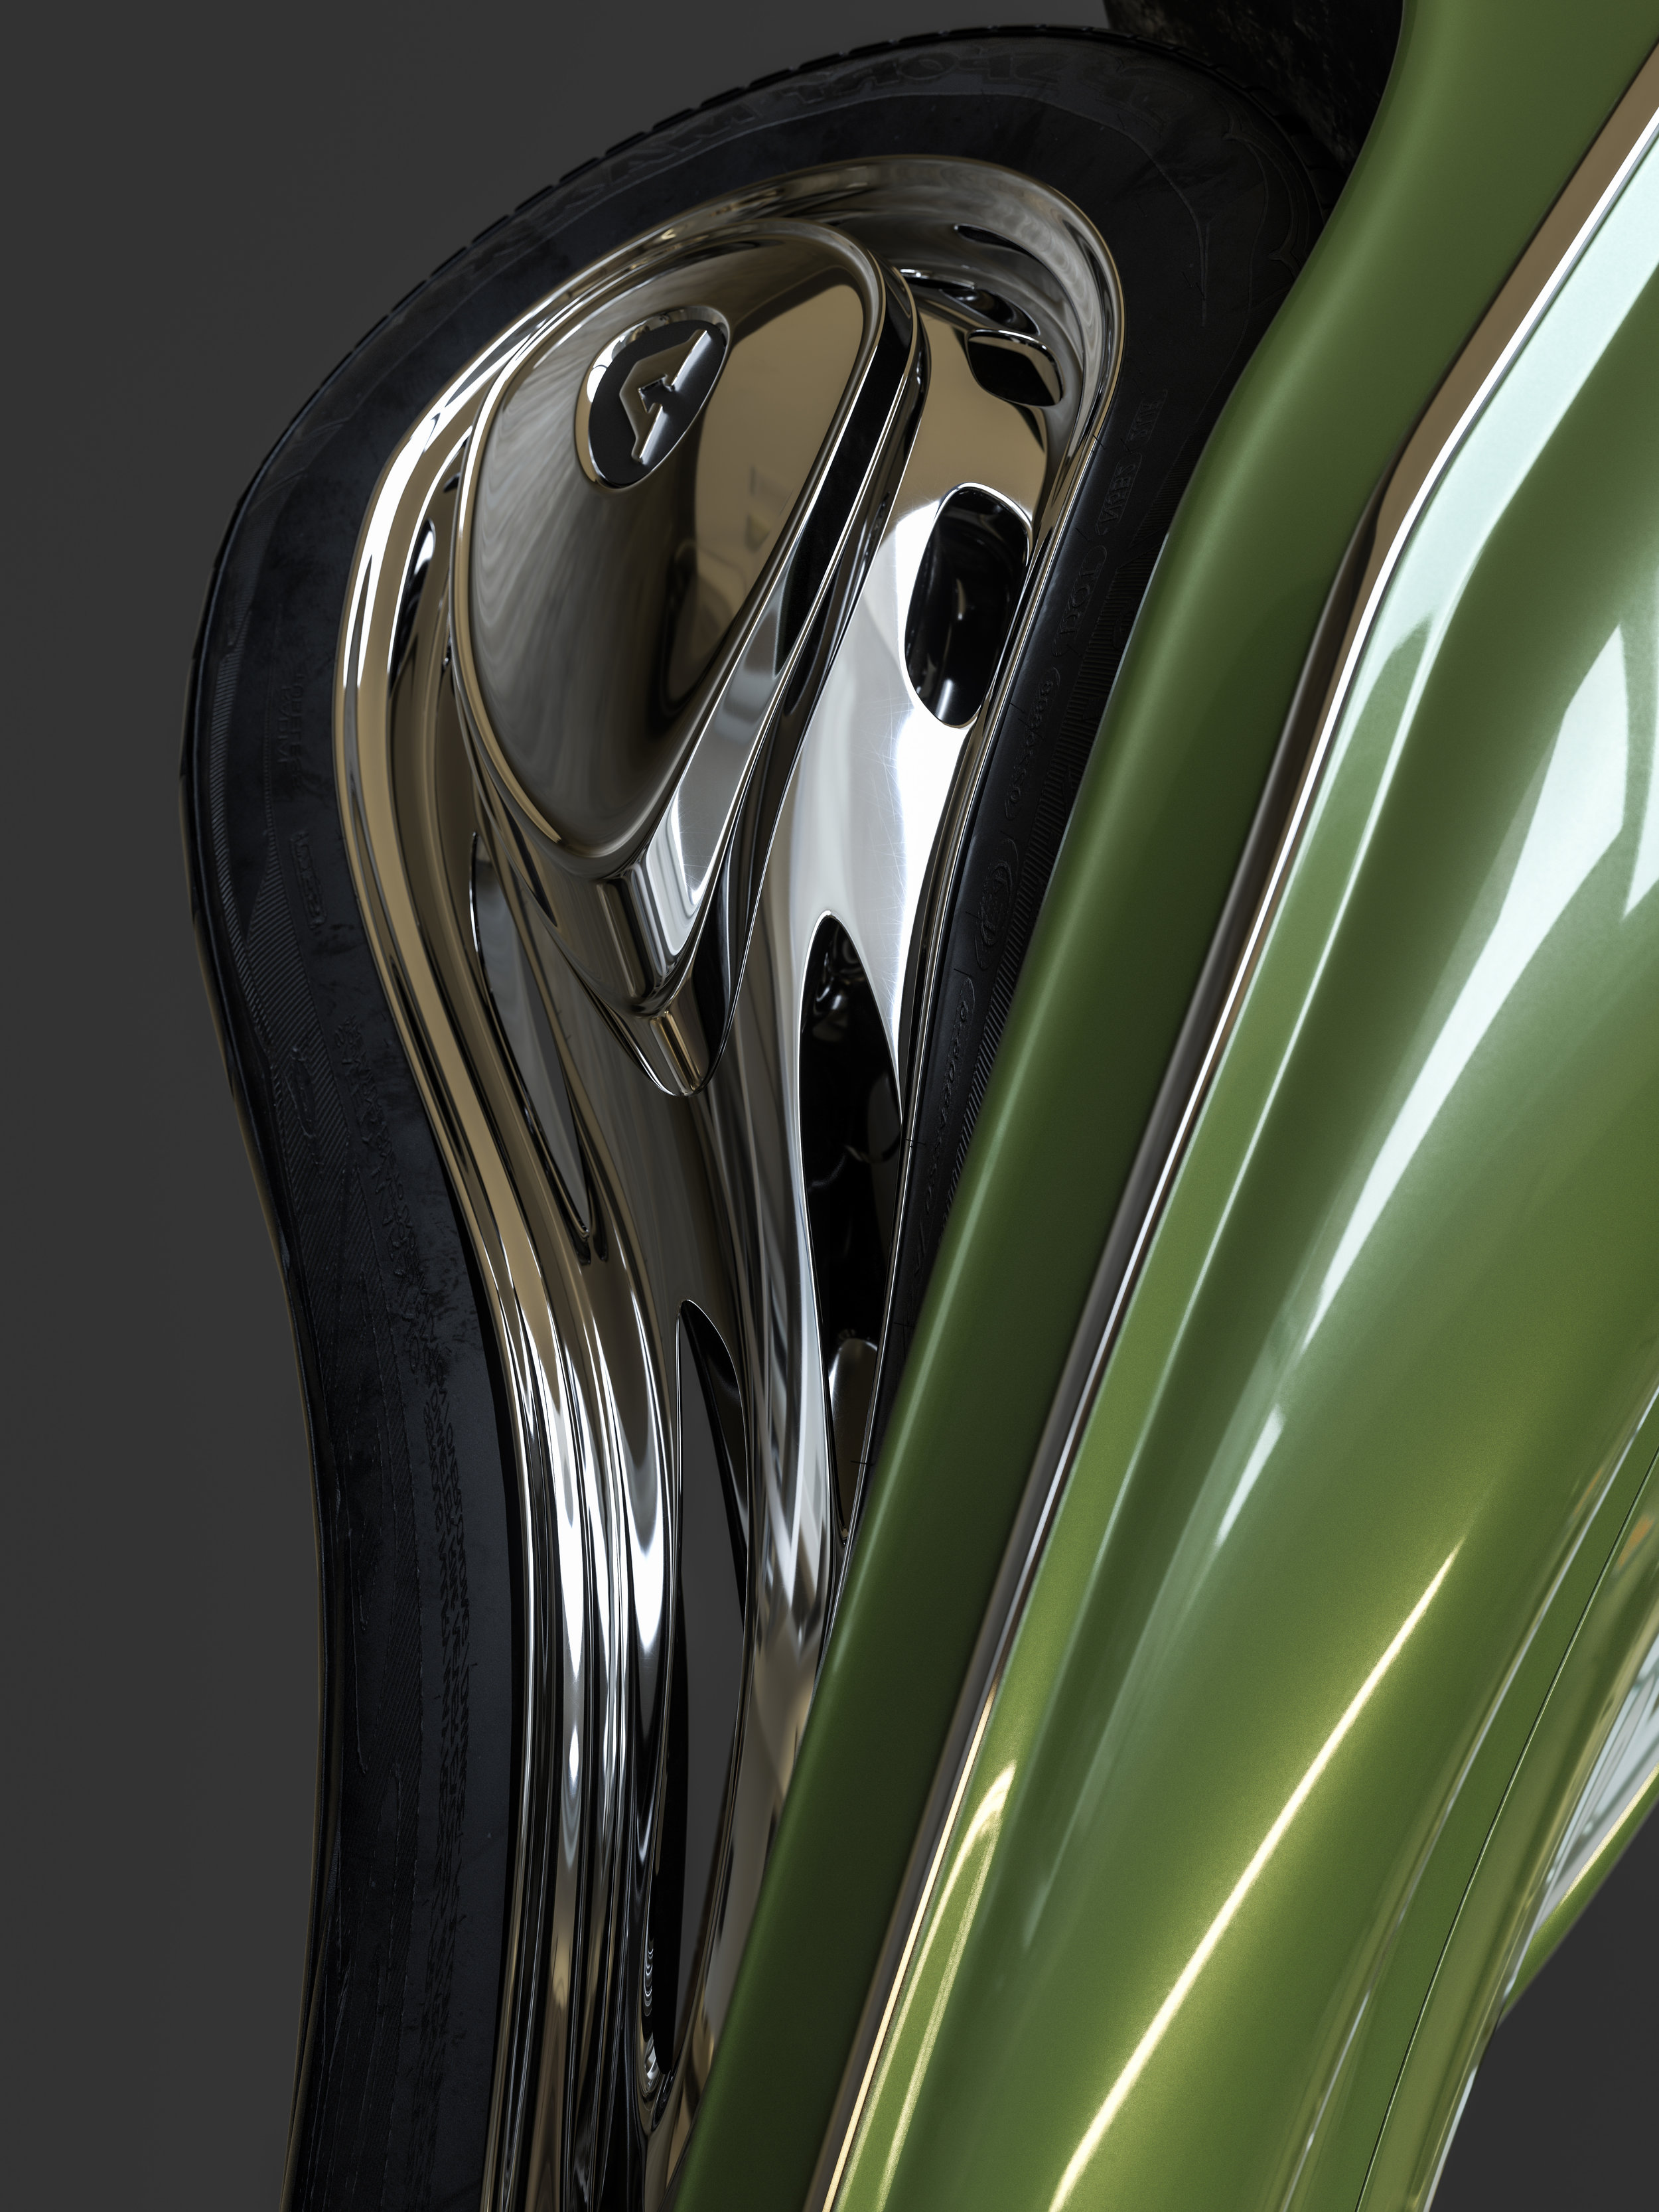 Carshot_MP_17-Maserati-Series_01.jpg